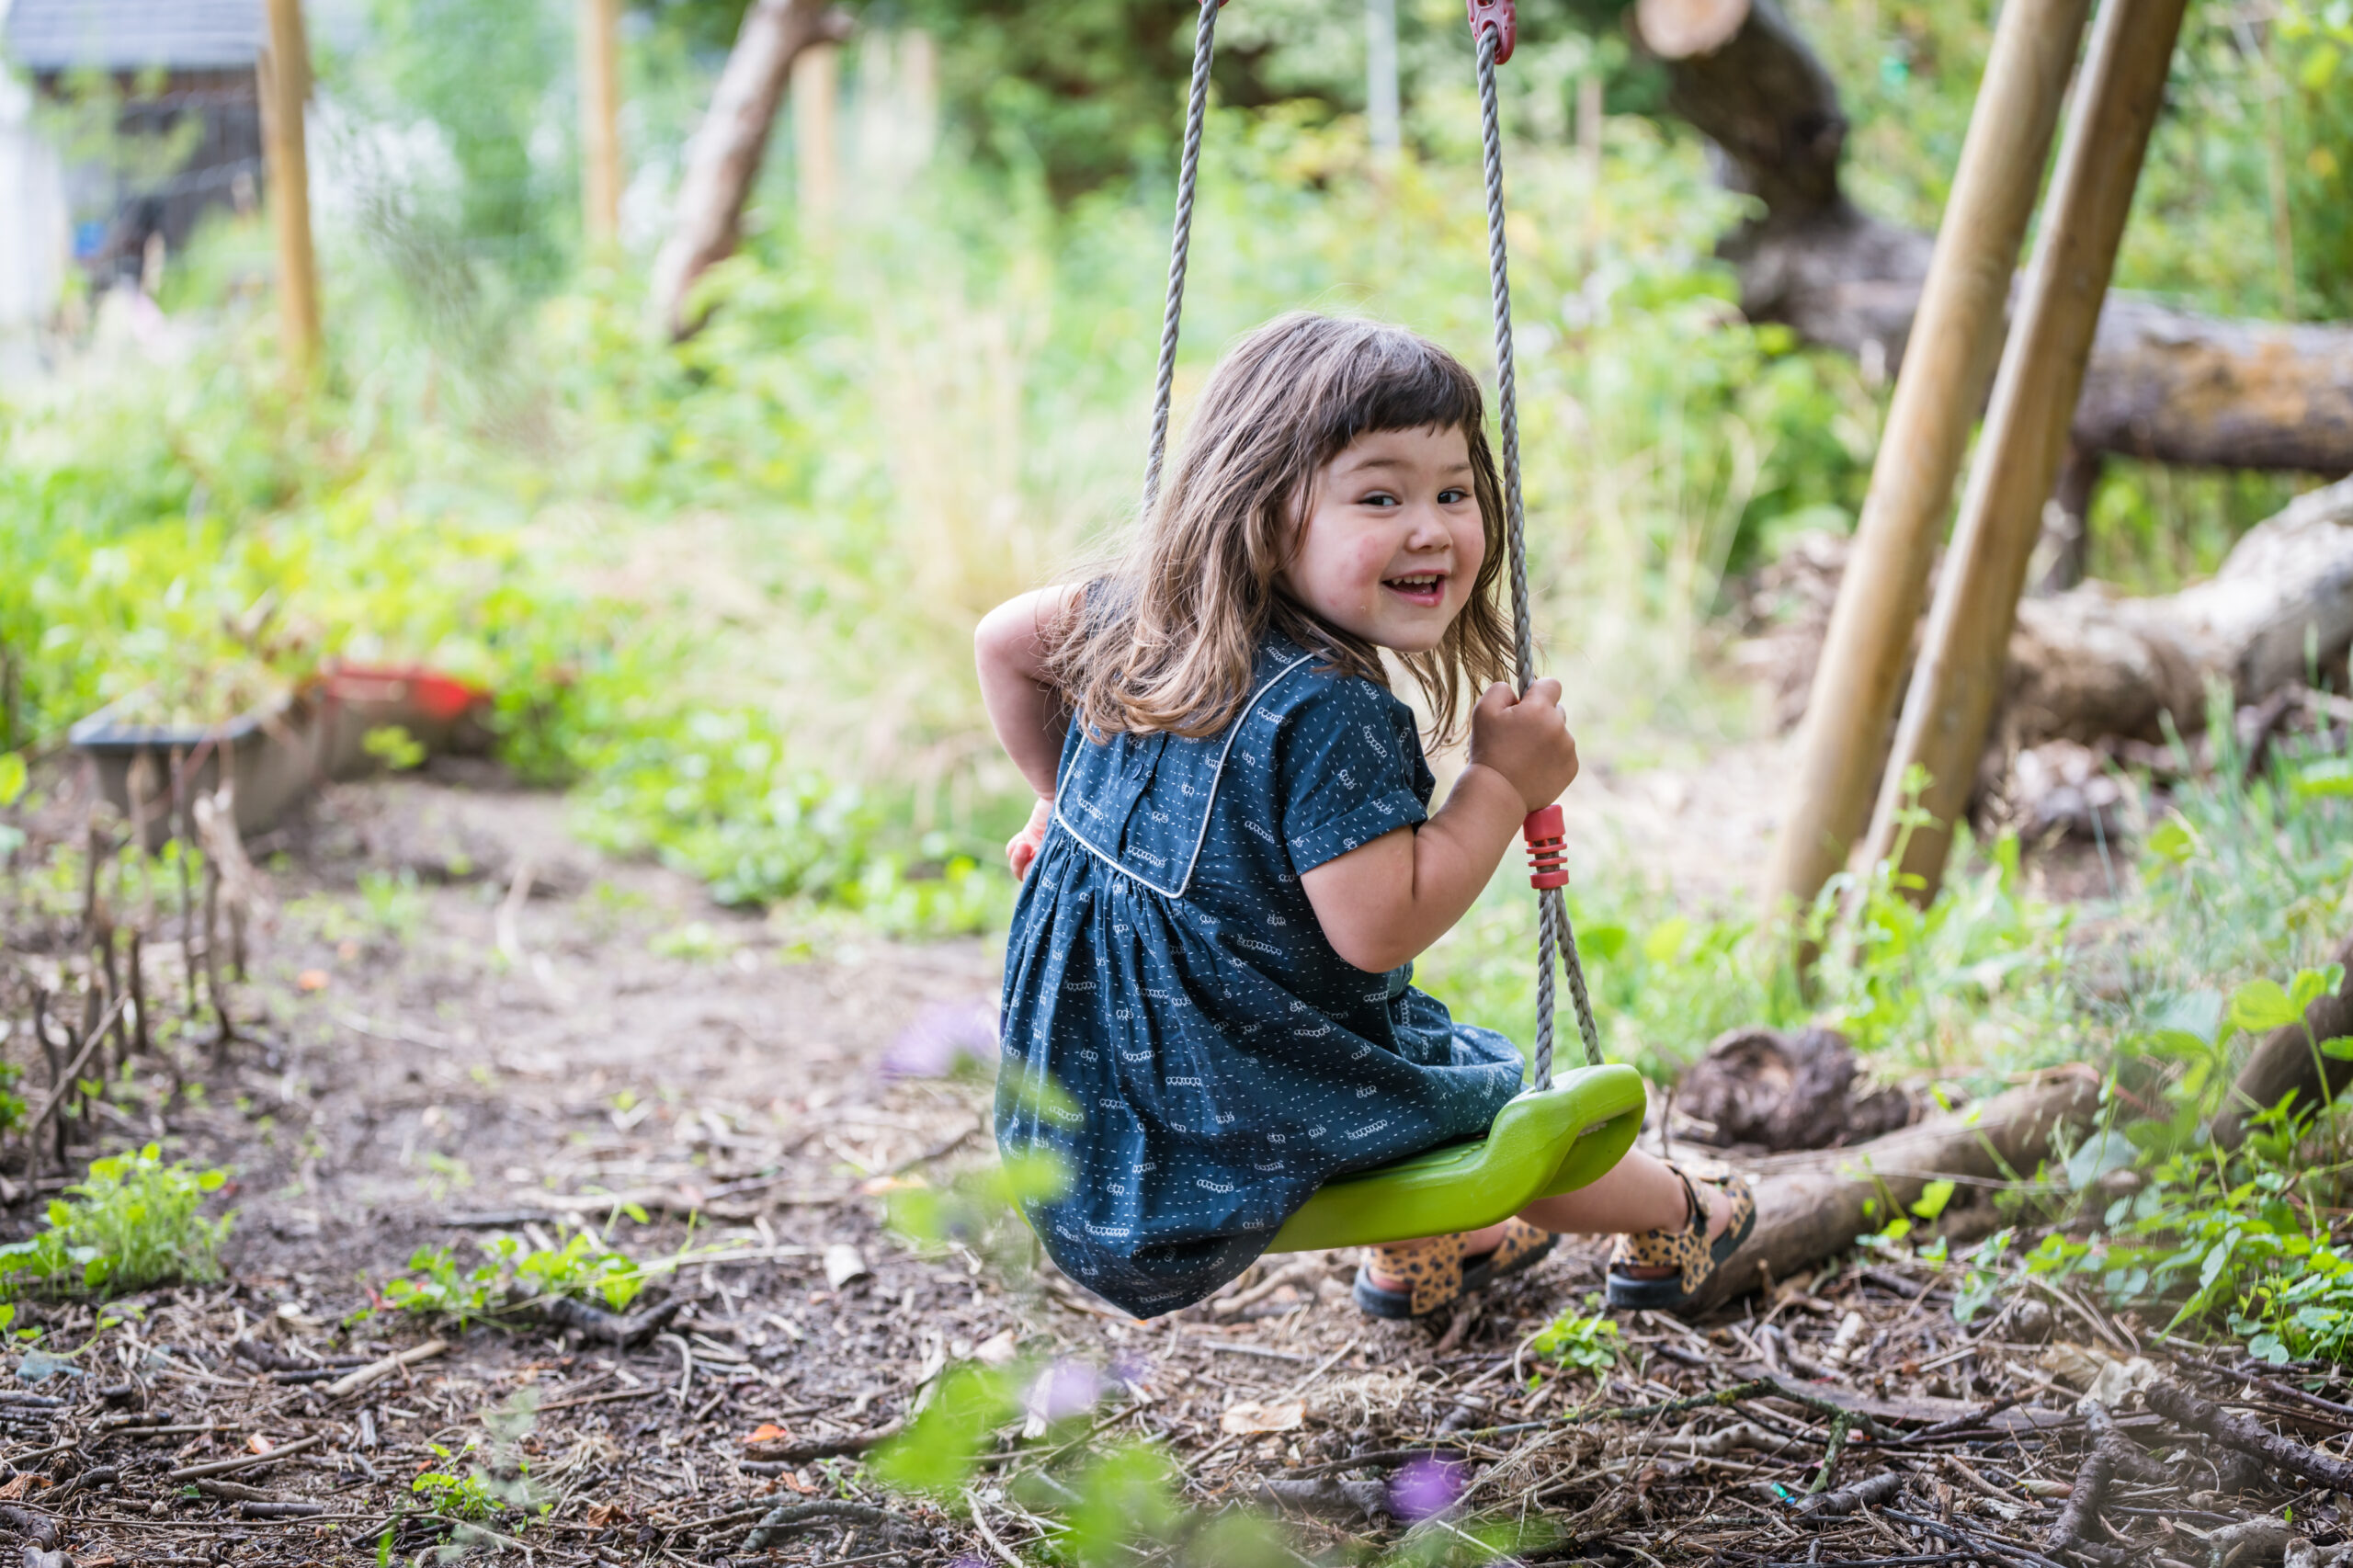 Kindje op schommel in tuin. Familie en portretfotografie